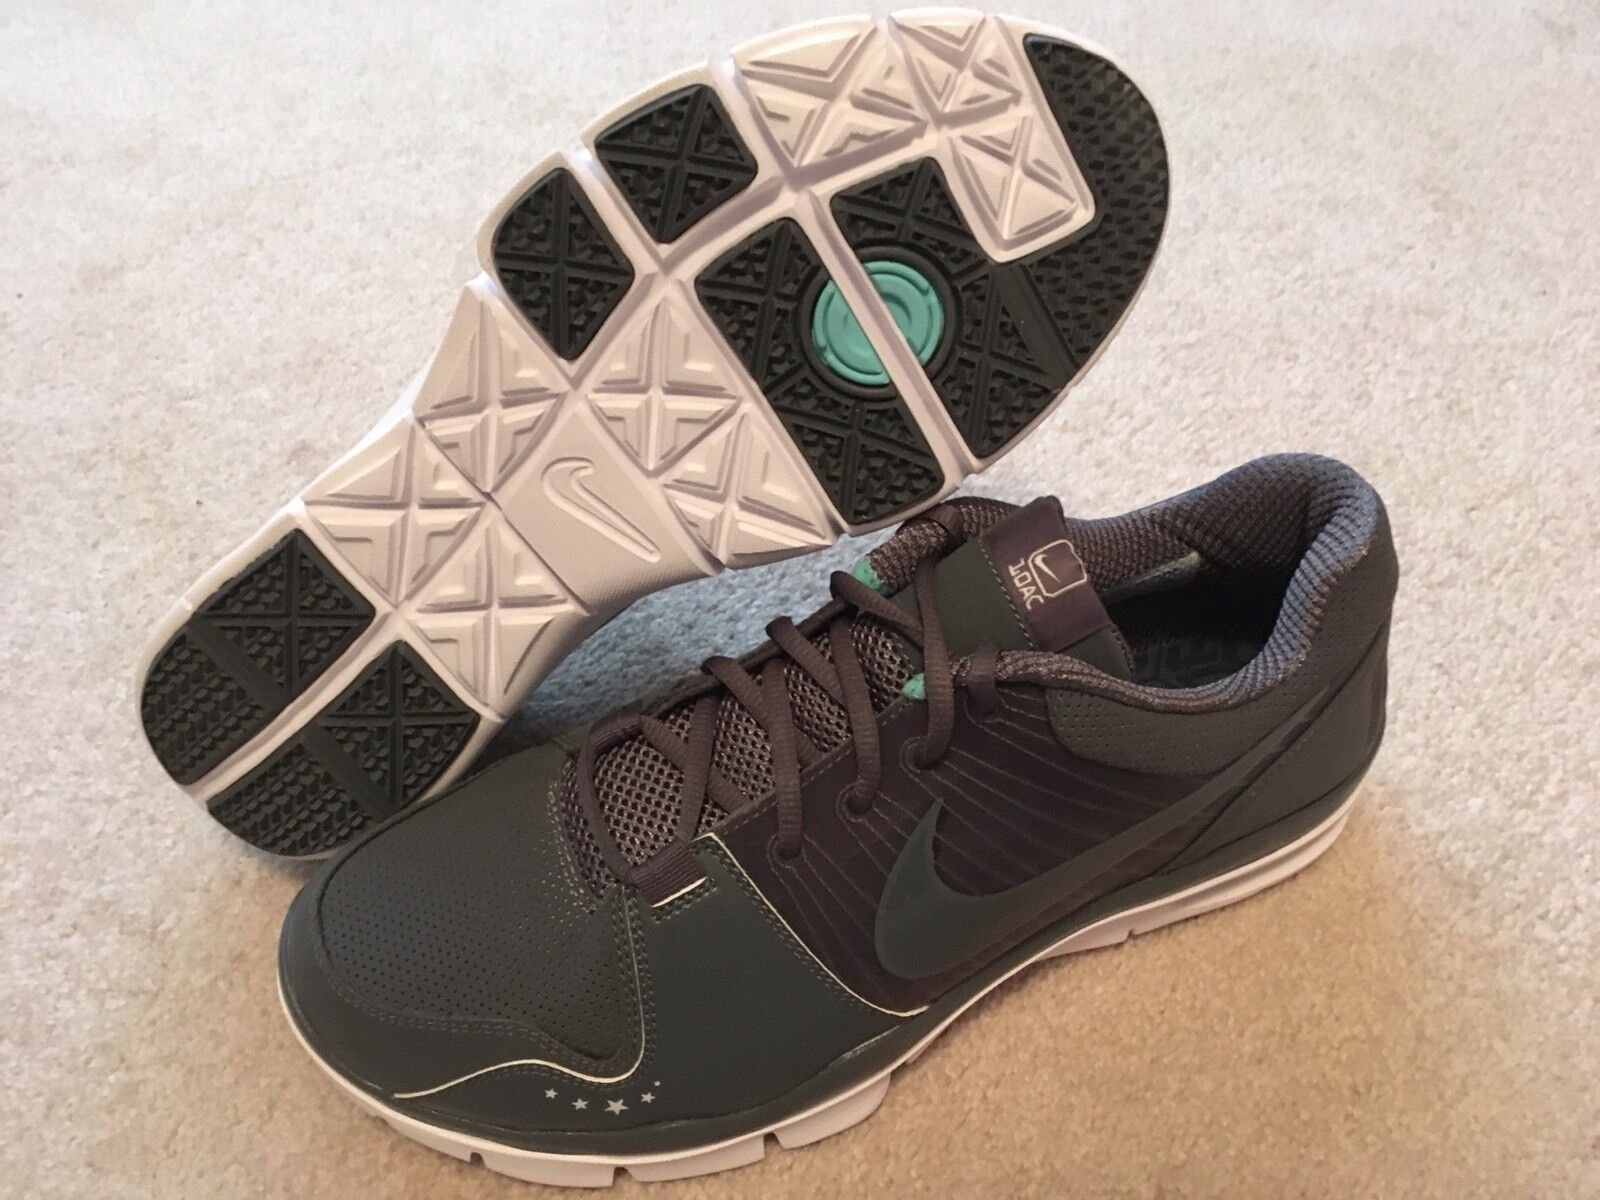 Nike Trainer 1 Caol Uno PE Sz 12.5 Promo Sample Nike Exclusive